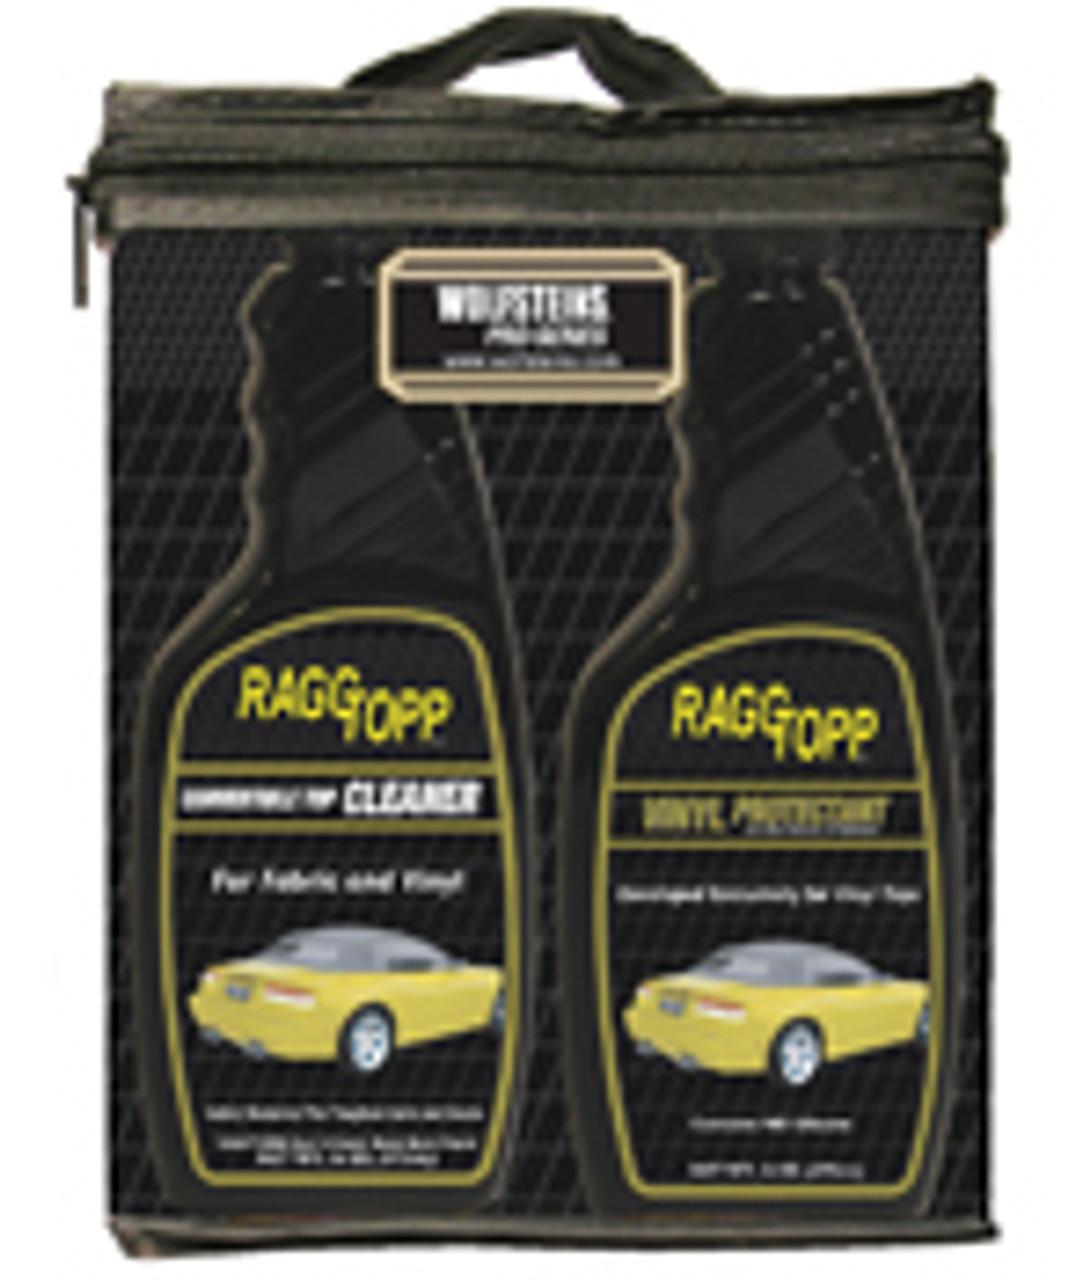 RAGGTOPP Convertible Top Vinyl Care Kit - #01164